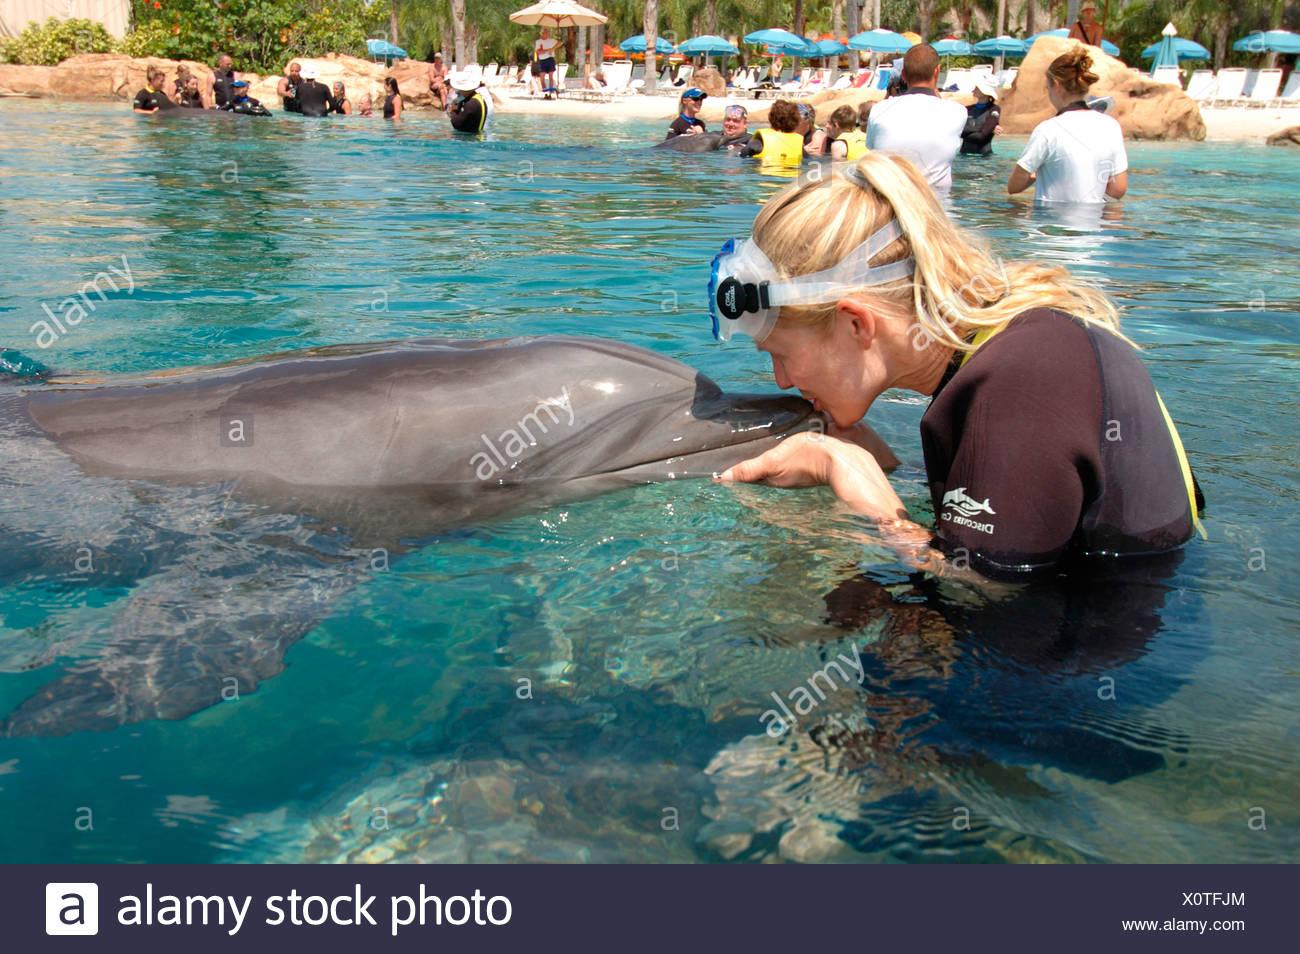 Woman kissing a dolphin, Discovery Cove, adventure park, Orlando, Florida, USA, North America - Stock Image